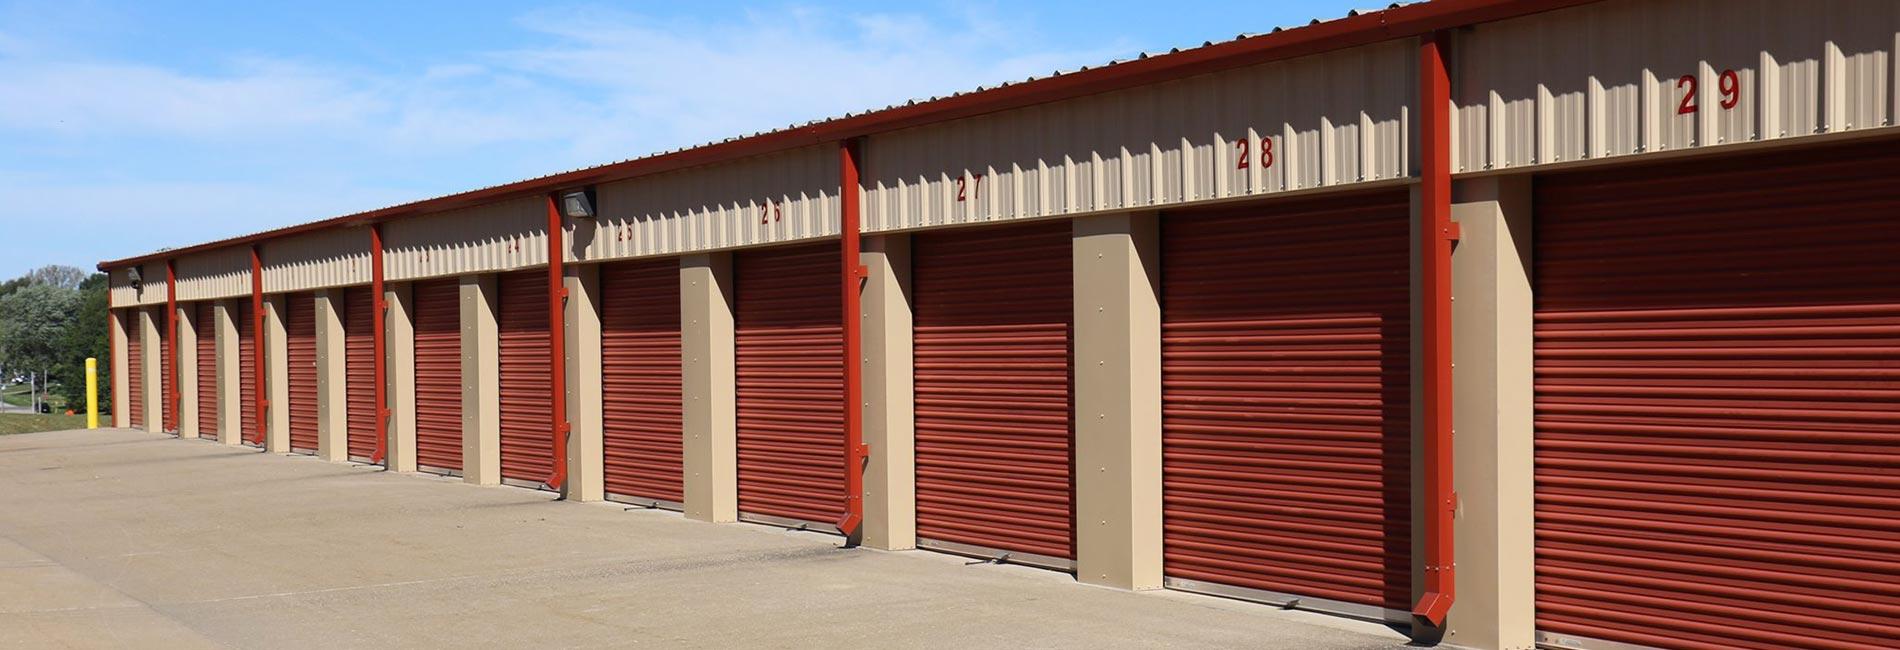 storage units bettendorf ia